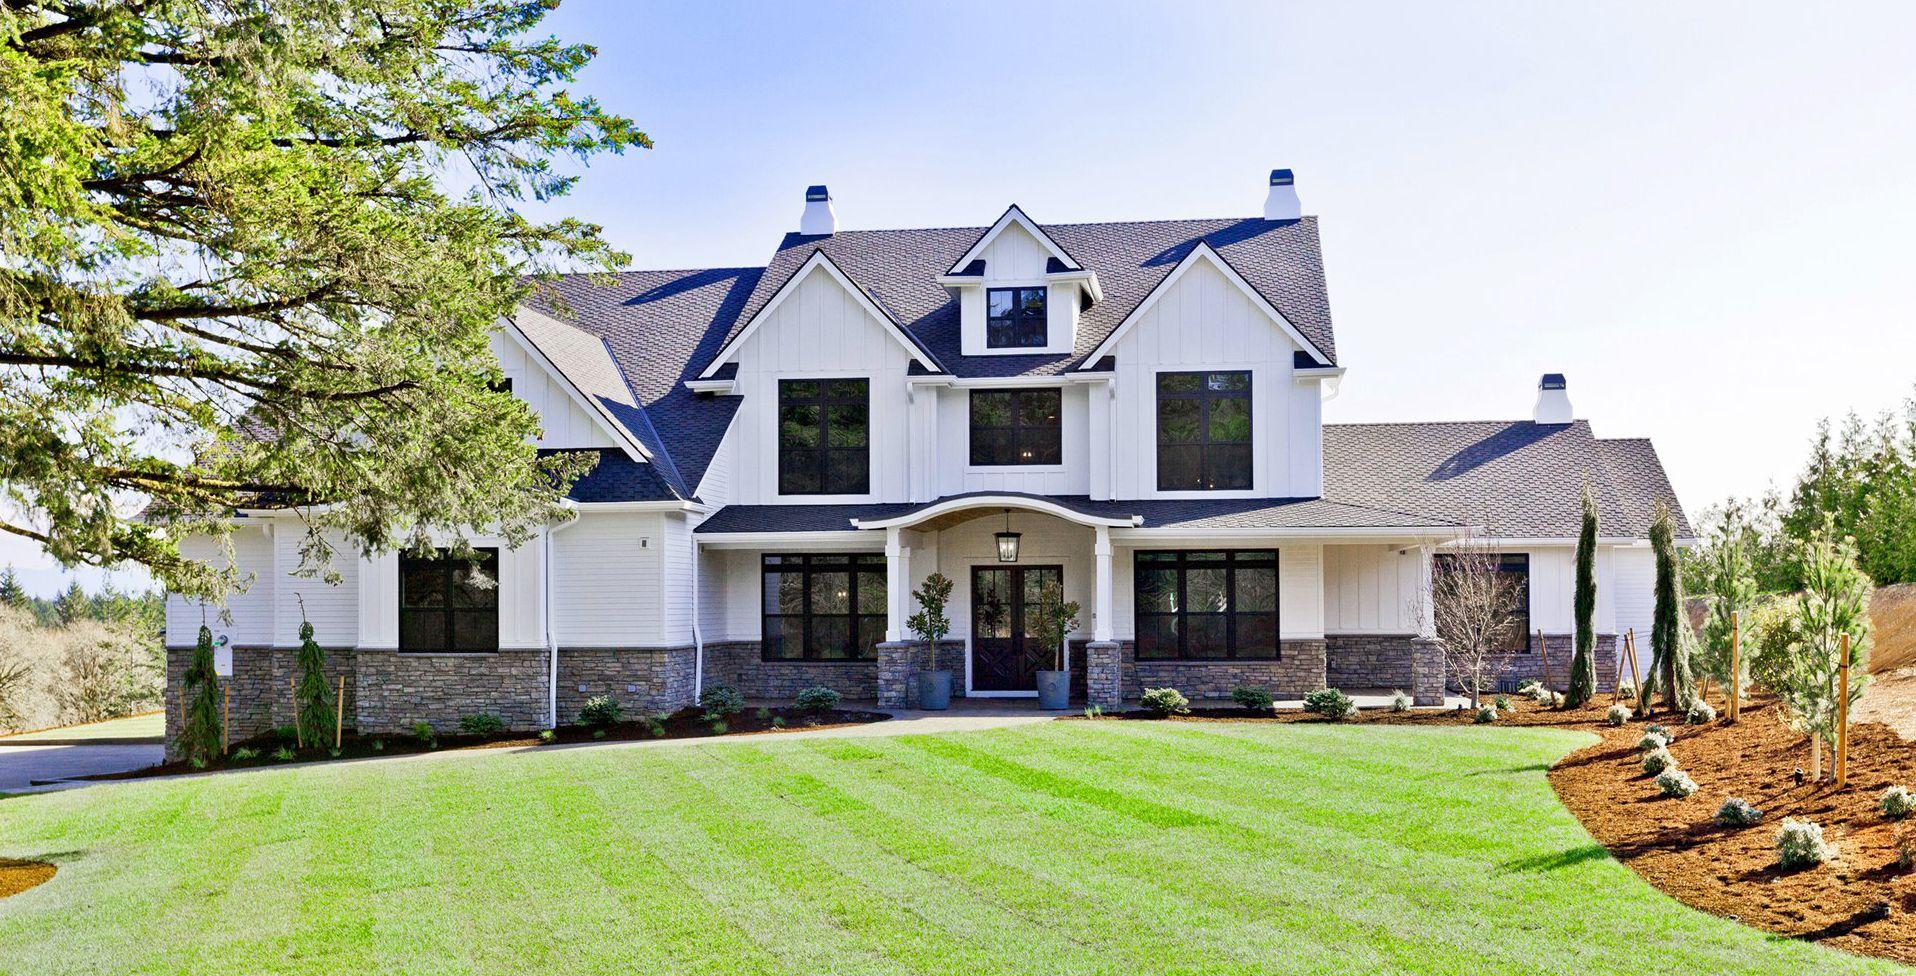 West Coast Eastgate House Plan in 2020 | Modern farmhouse ...